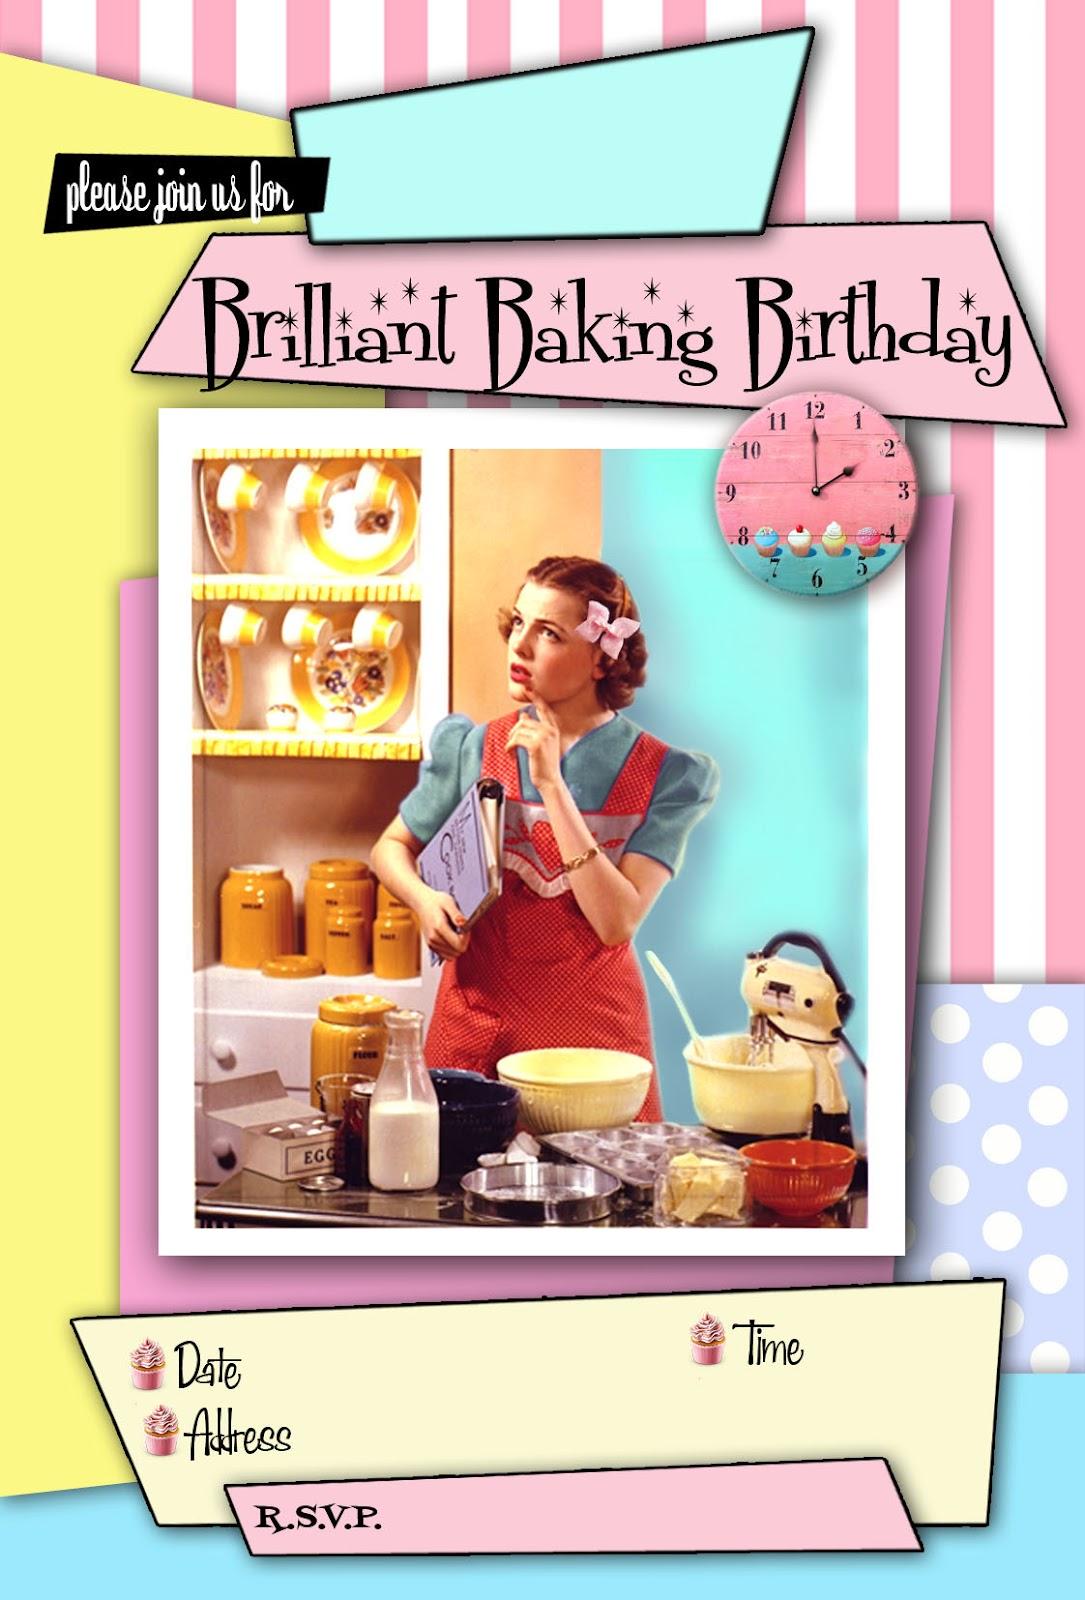 FREE Kids Party Invitations Baking Invitation 50s Style